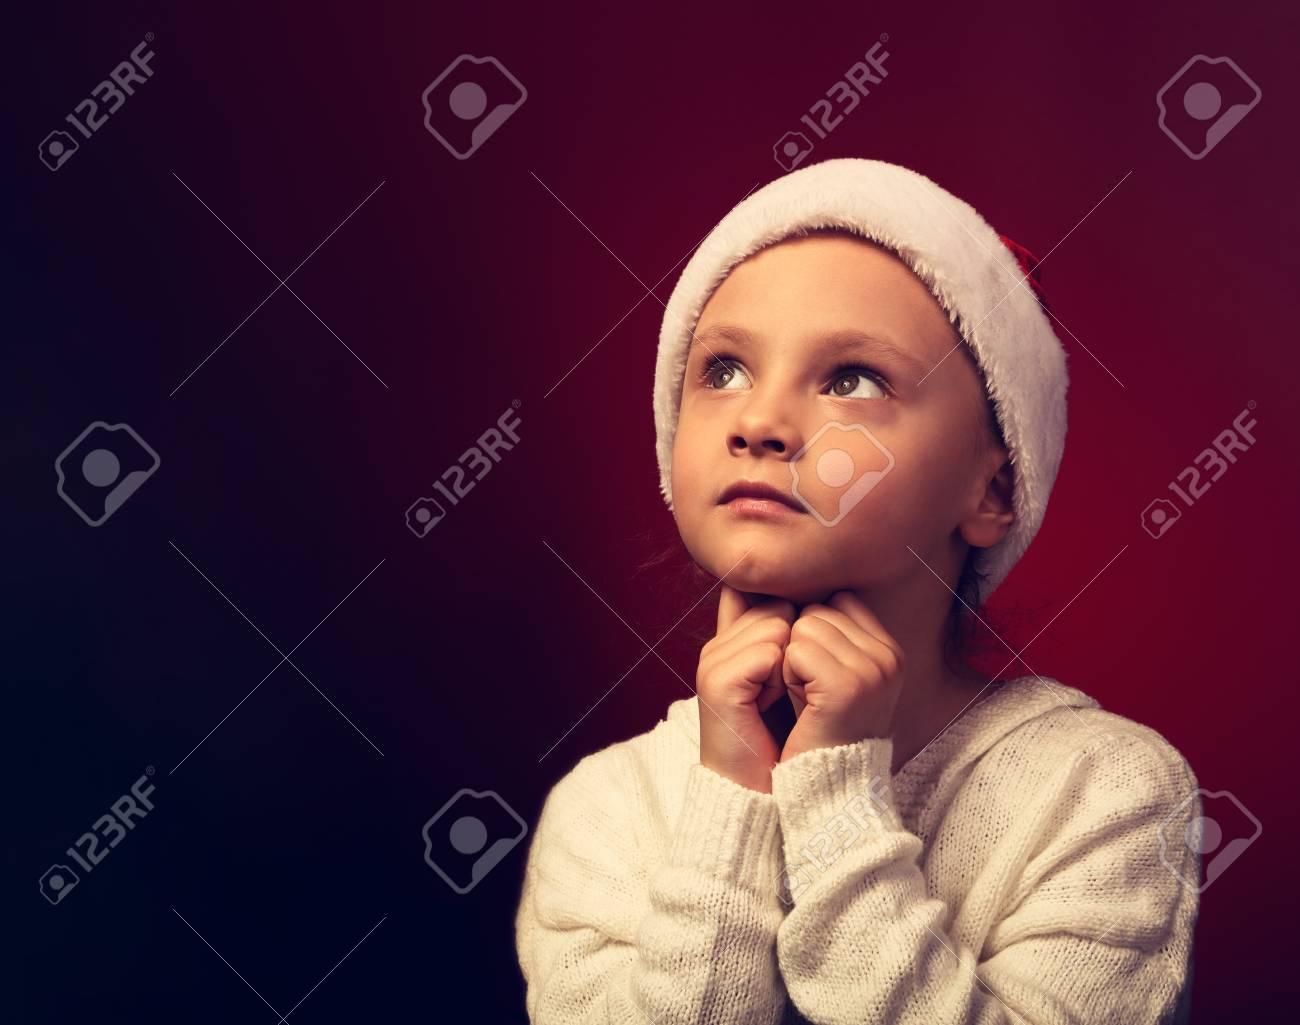 6d15feb985ae5 Cute Happy Kid Girl In Fur Christmas Santa Claus Hat Asking